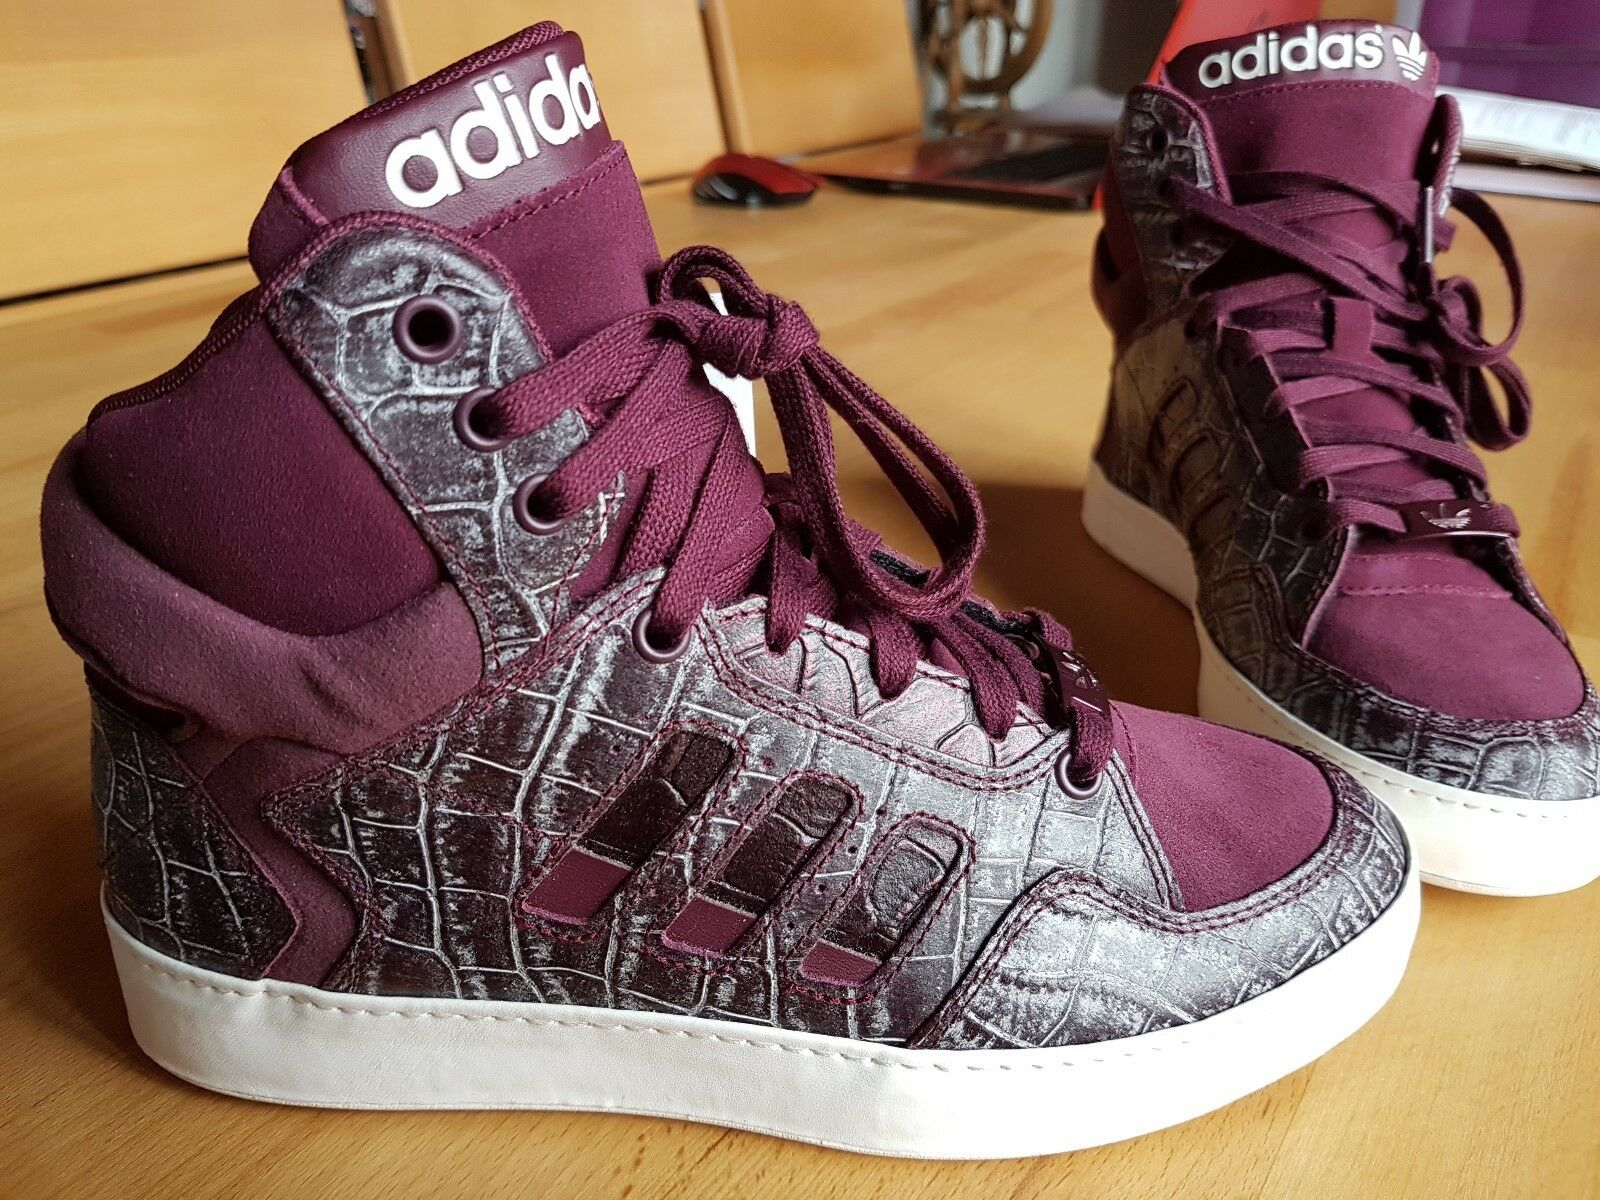 adidas - Damen Kinder Sneaker - BANKSHOT 2. 0 W - ,36 2/3, Maroon, -NEU-